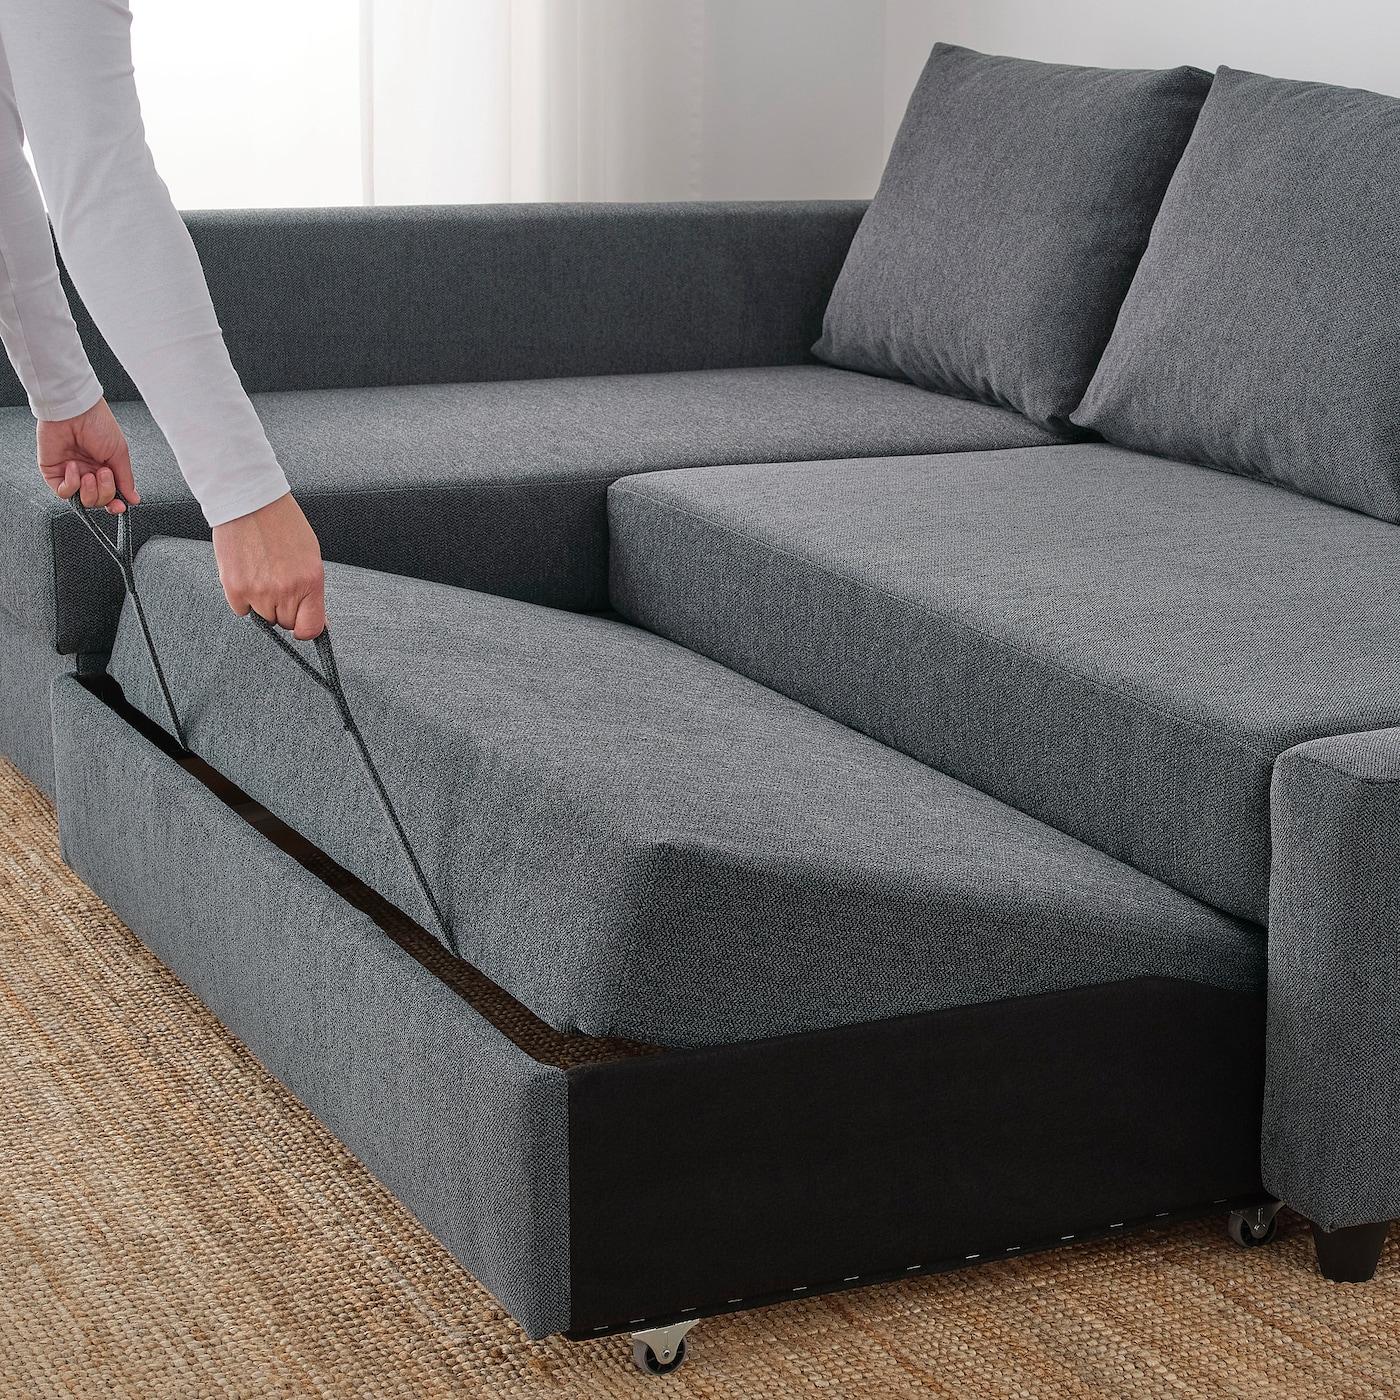 Friheten Hoekslaapbank Skiftebo Donkergrijs Ikea.Friheten Corner Sofa Bed With Storage Hyllie Dark Grey Ikea